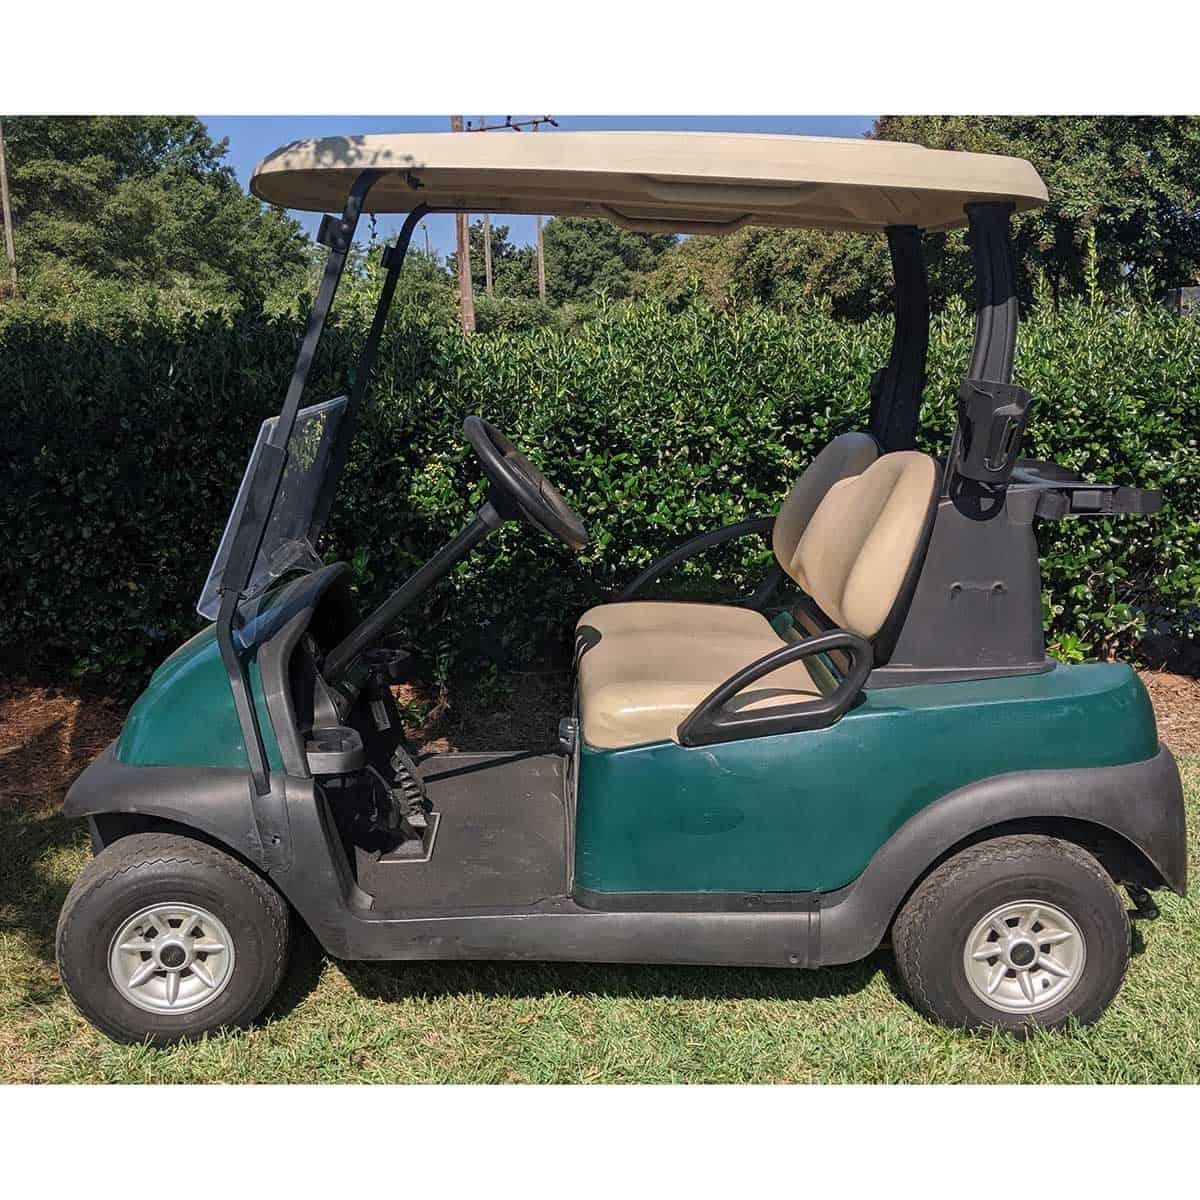 Green-2015-Club-Car-2-Pass-Side